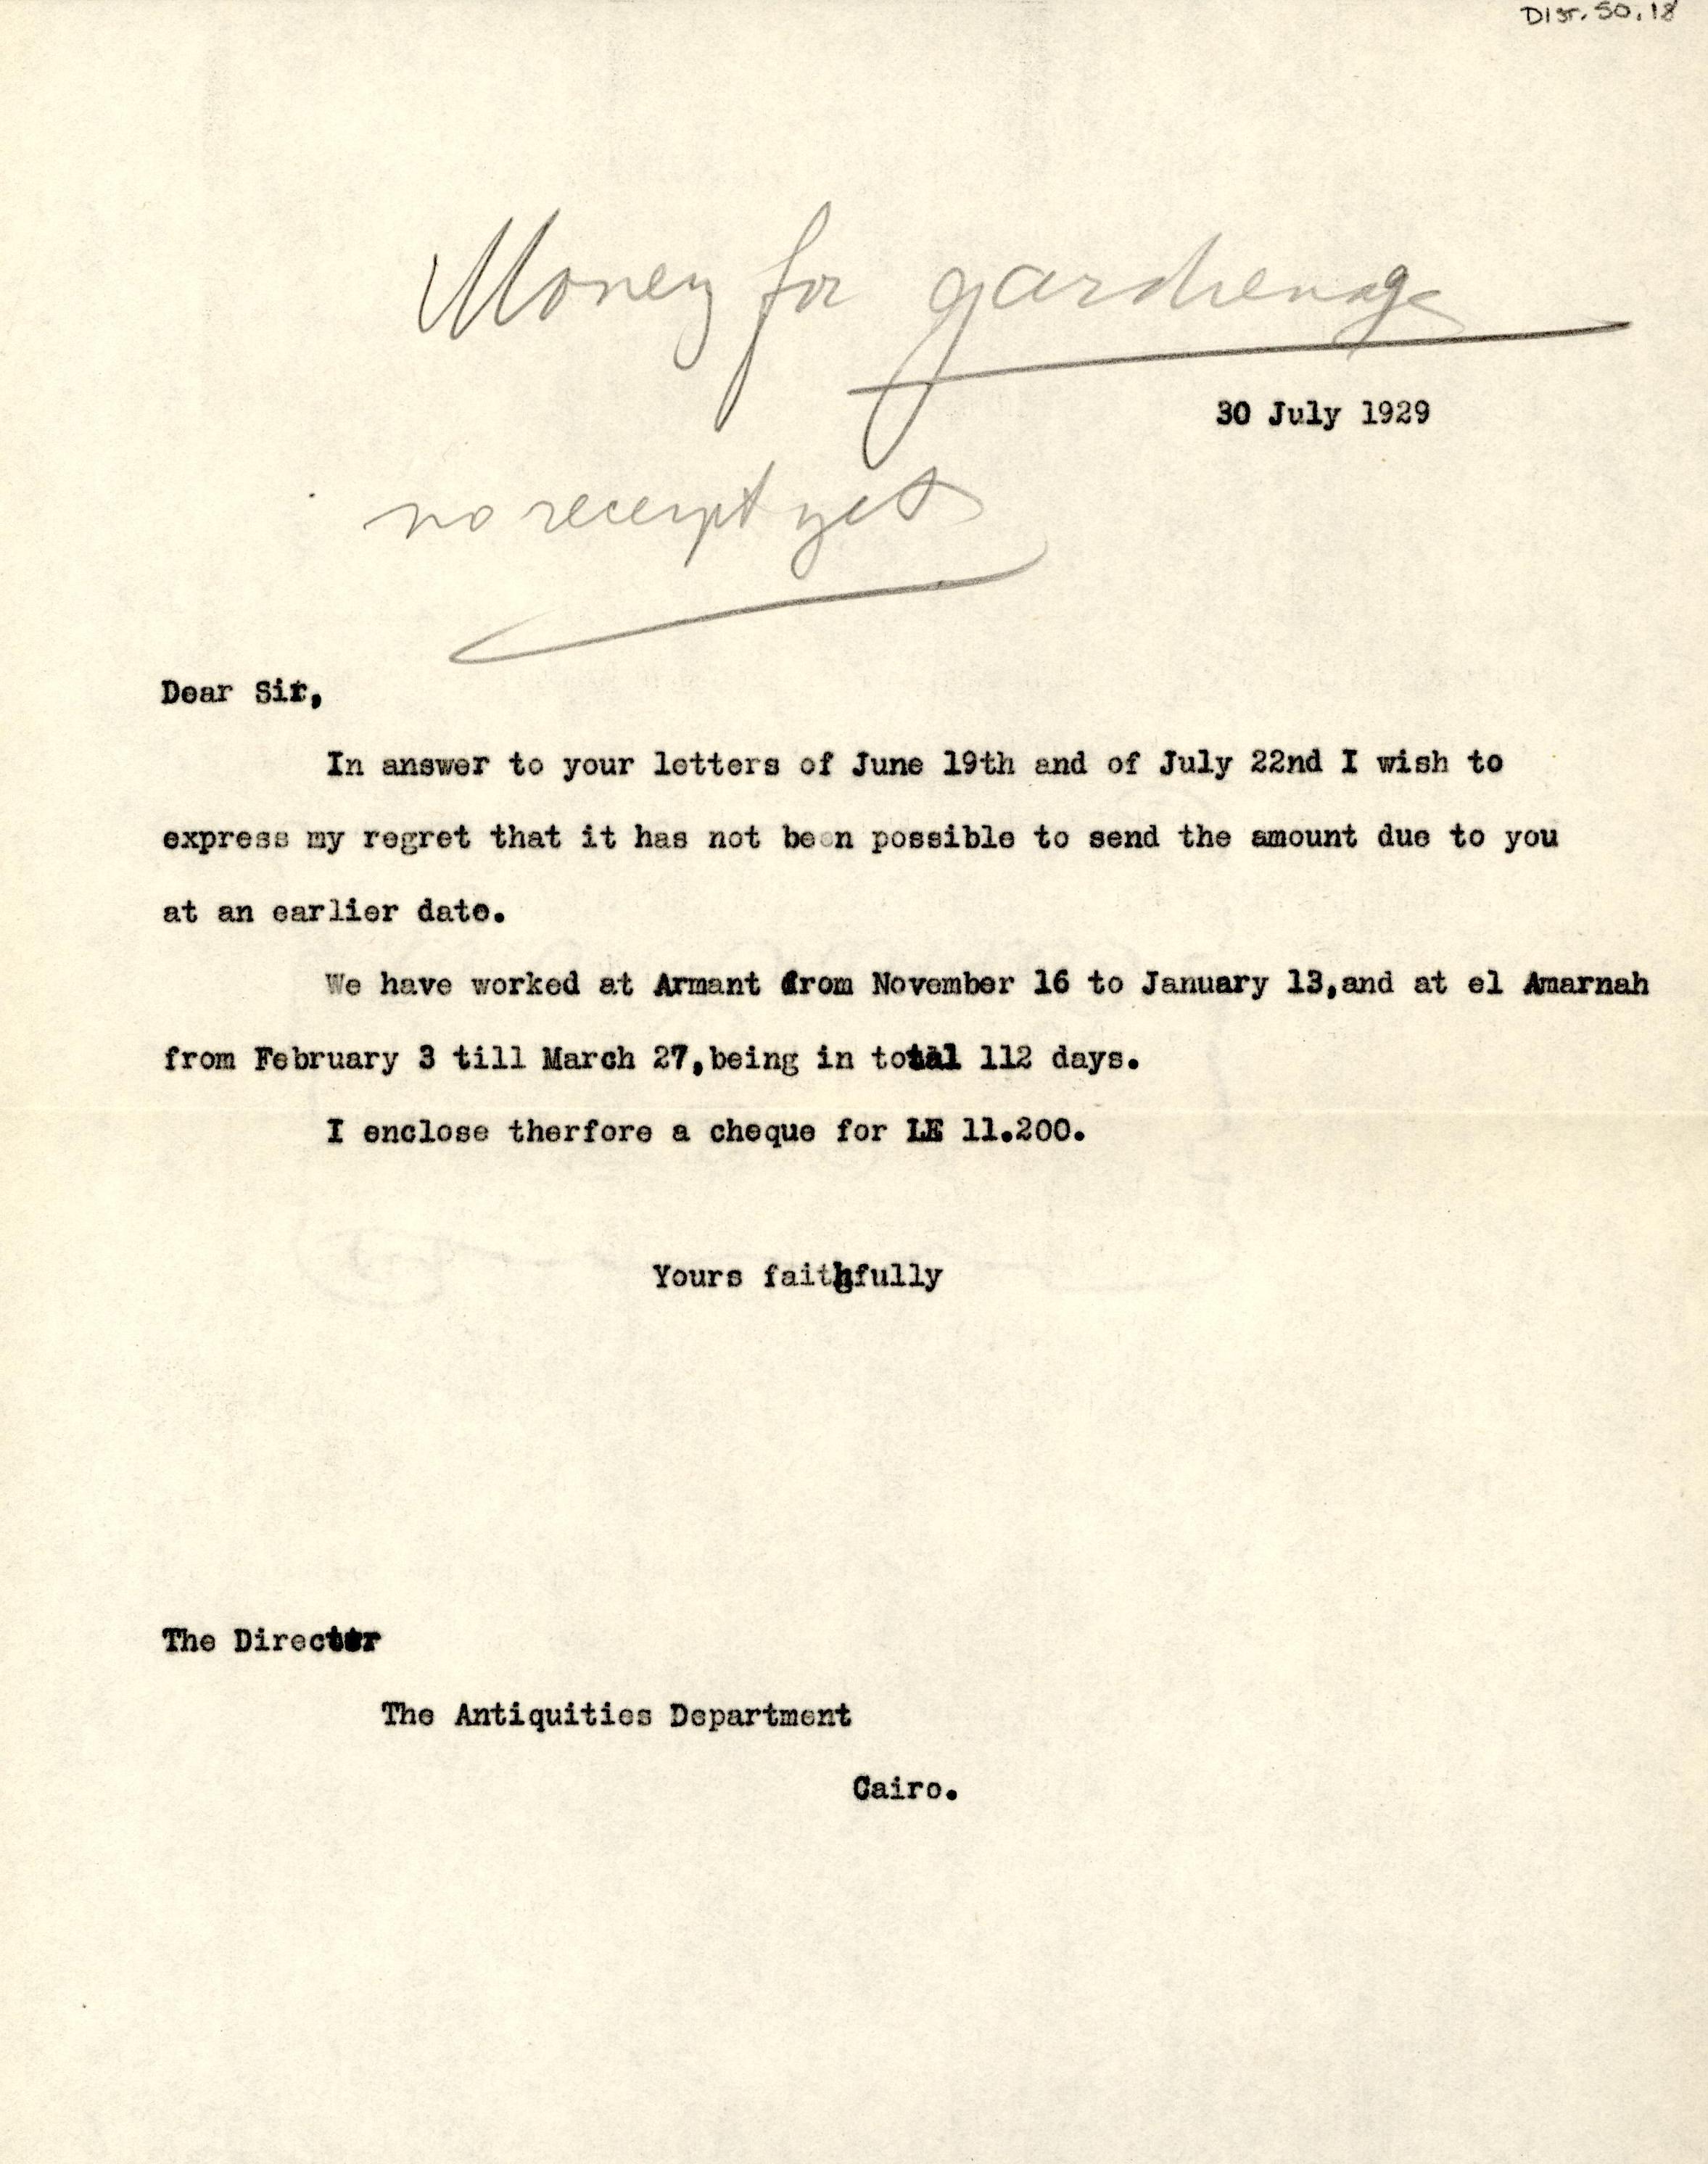 1926-39 correspondence with Antiquities Service DIST.50.18